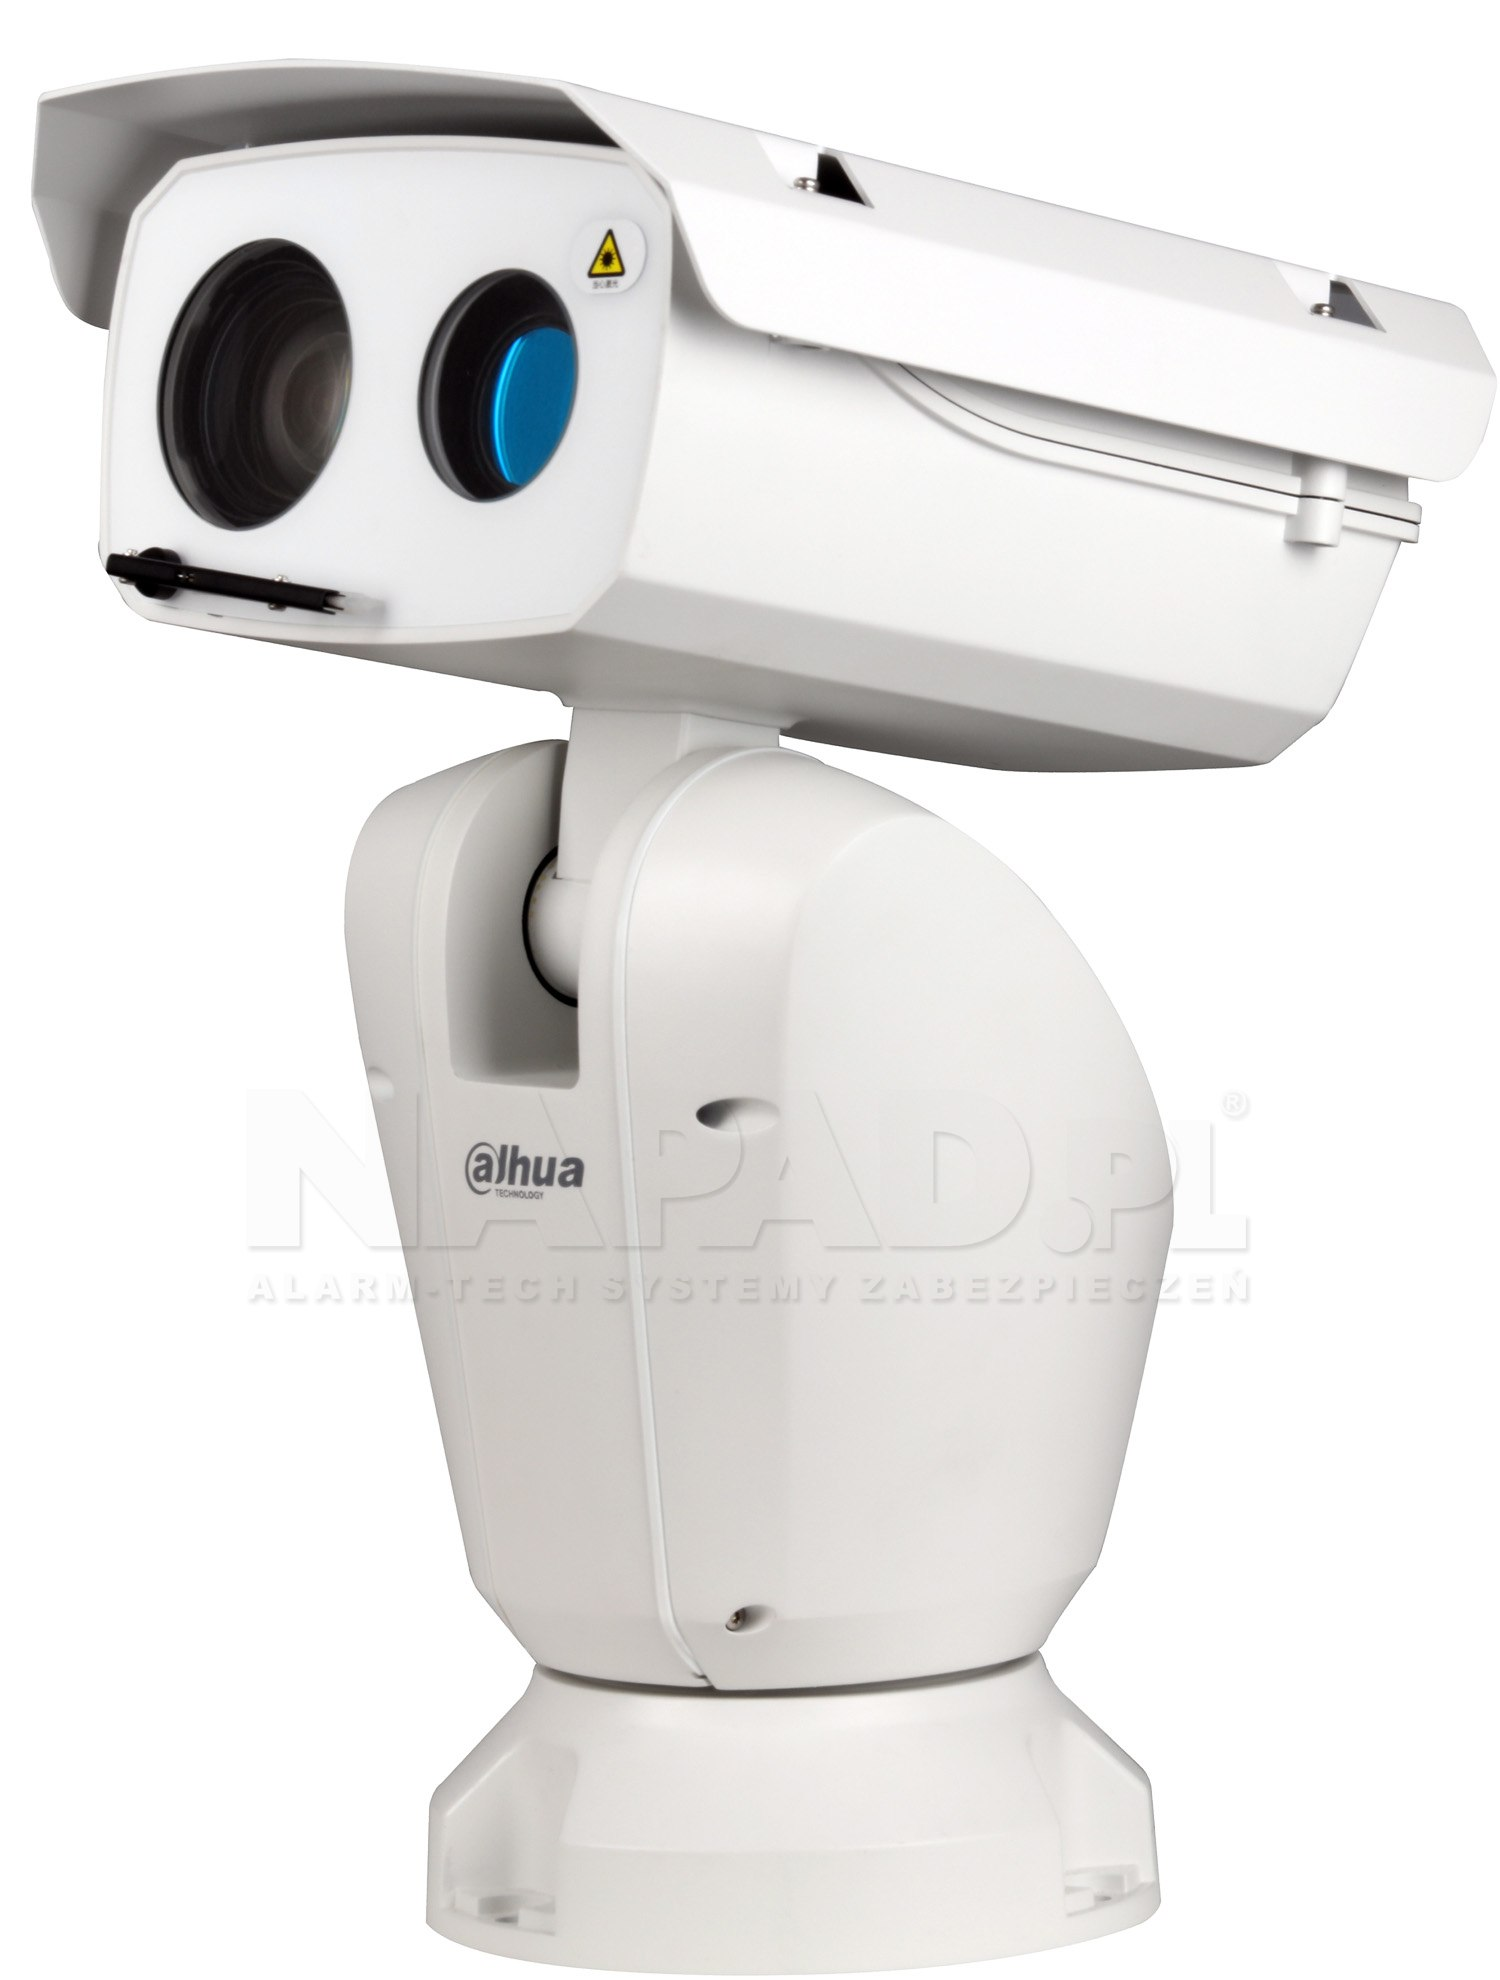 Kamera IP 2Mpx DH-PTZ12248V-LR8-N